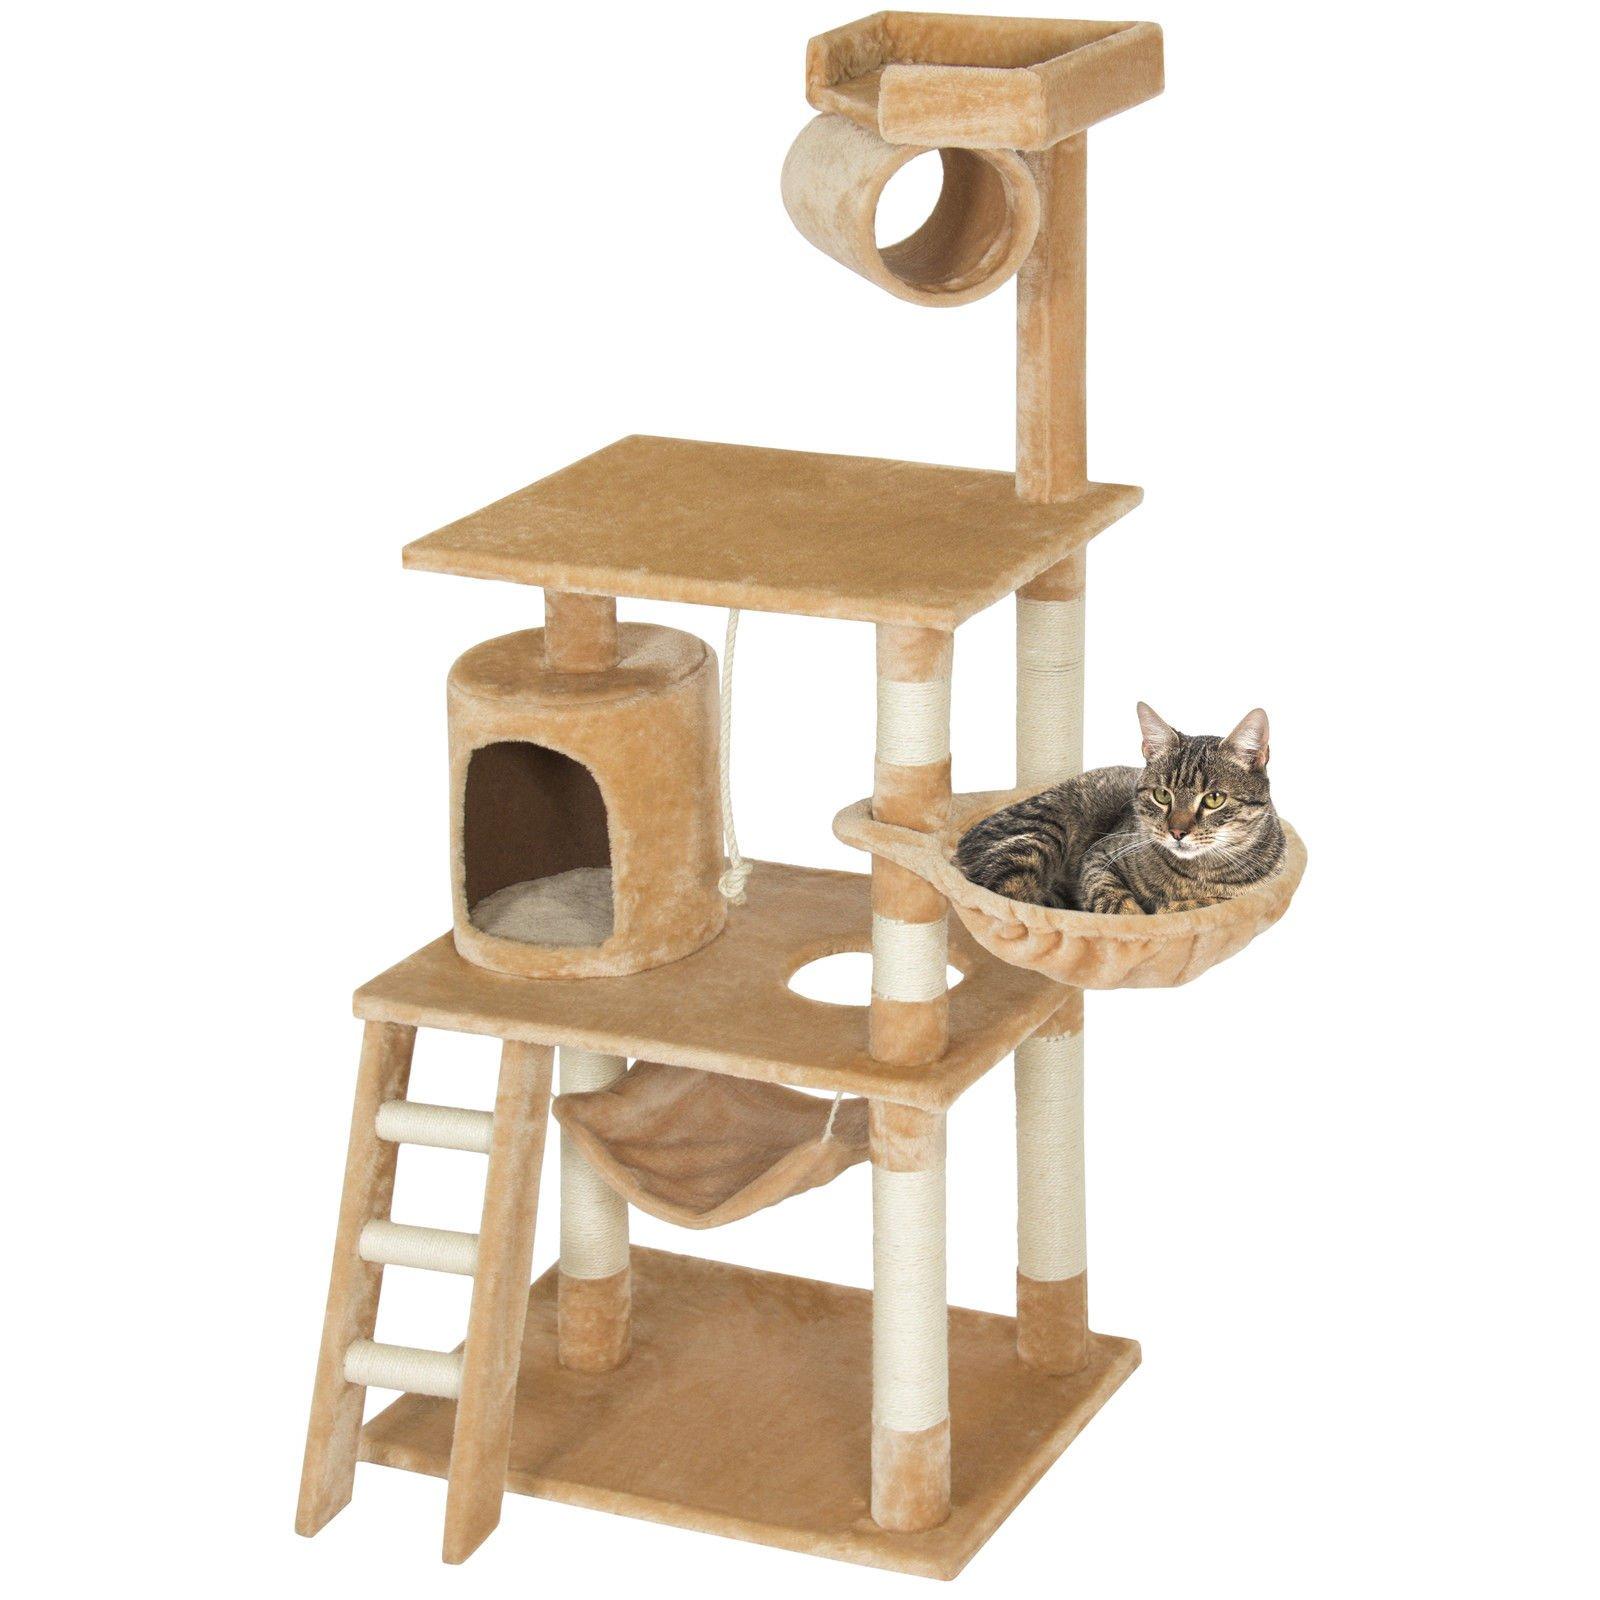 Eight24hours Pet Play House 60'' Cat Tree Scratcher Condo Furniture - Beige + FREE E-Book